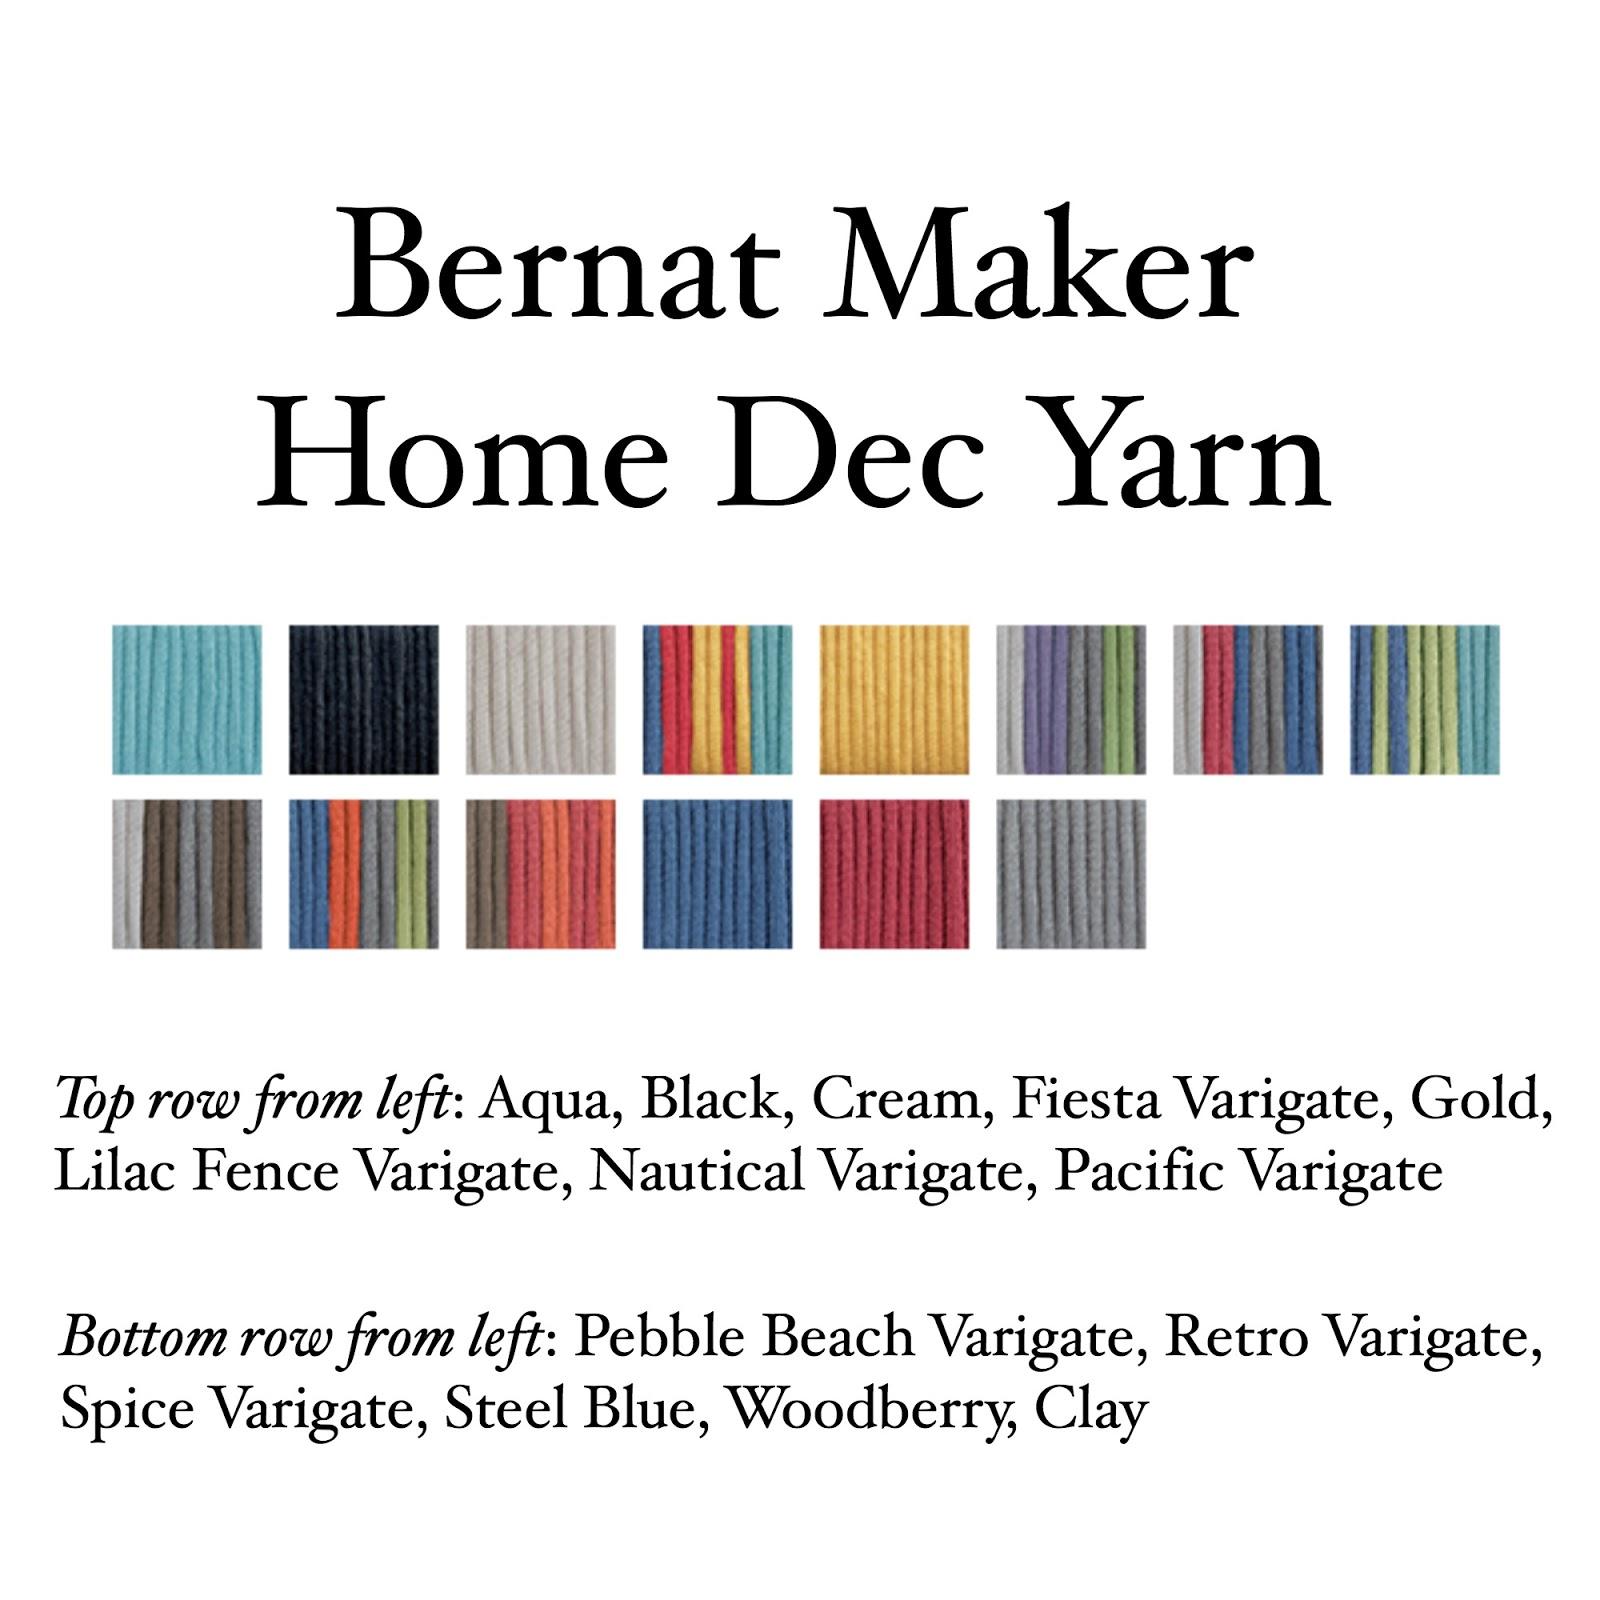 Bernat Maker Home Dec Yarn Fabric Woodberry